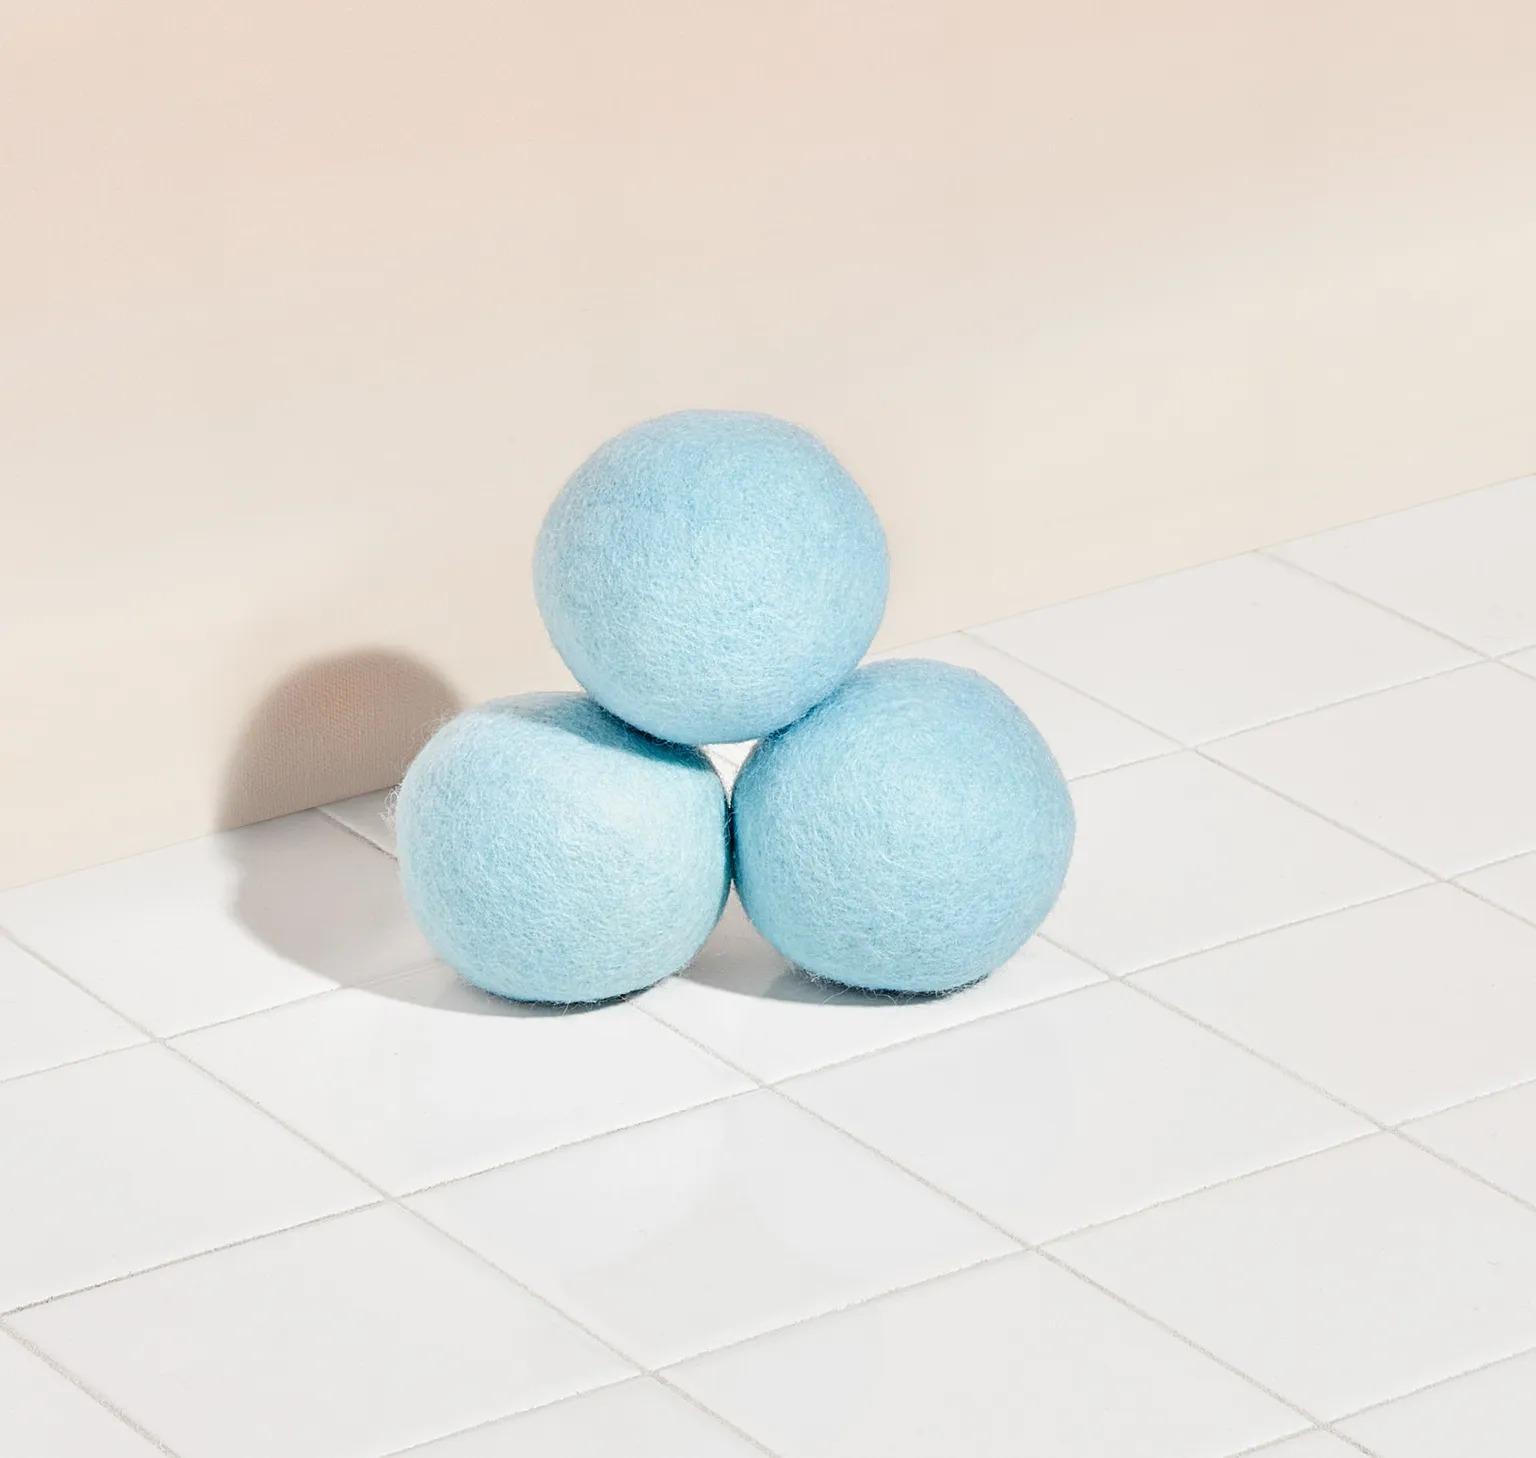 Blueland Dryer Ball Starter Set